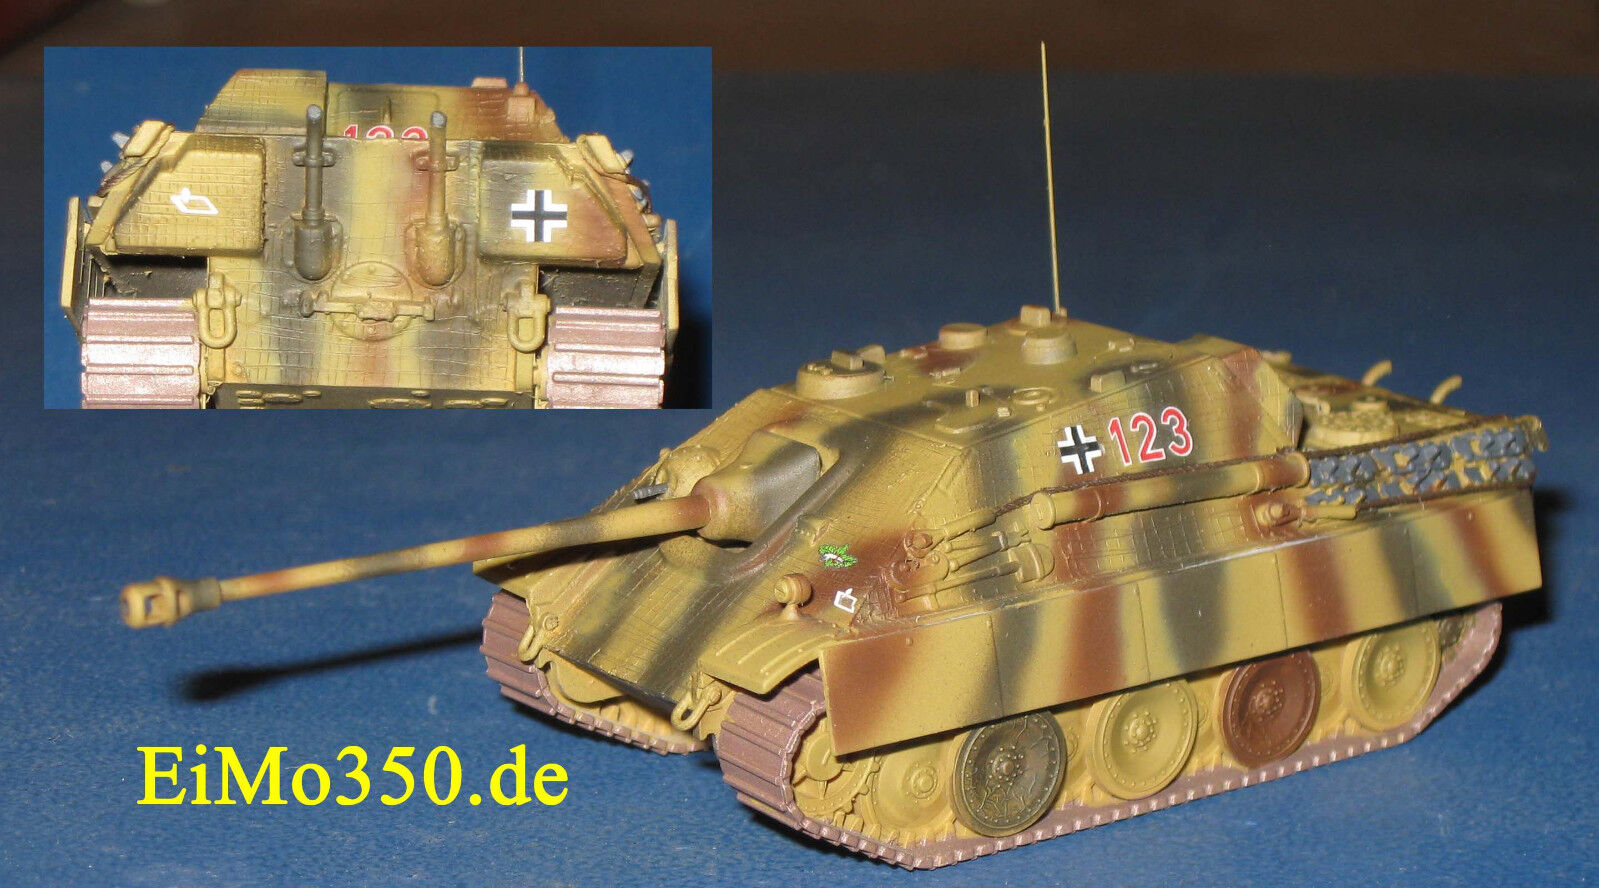 Jagdpanther Sd.Kfz 173 Ausf. früh sPzJgAbt 654  1 87 H0 Minitank WKII Trident  | Verkauf